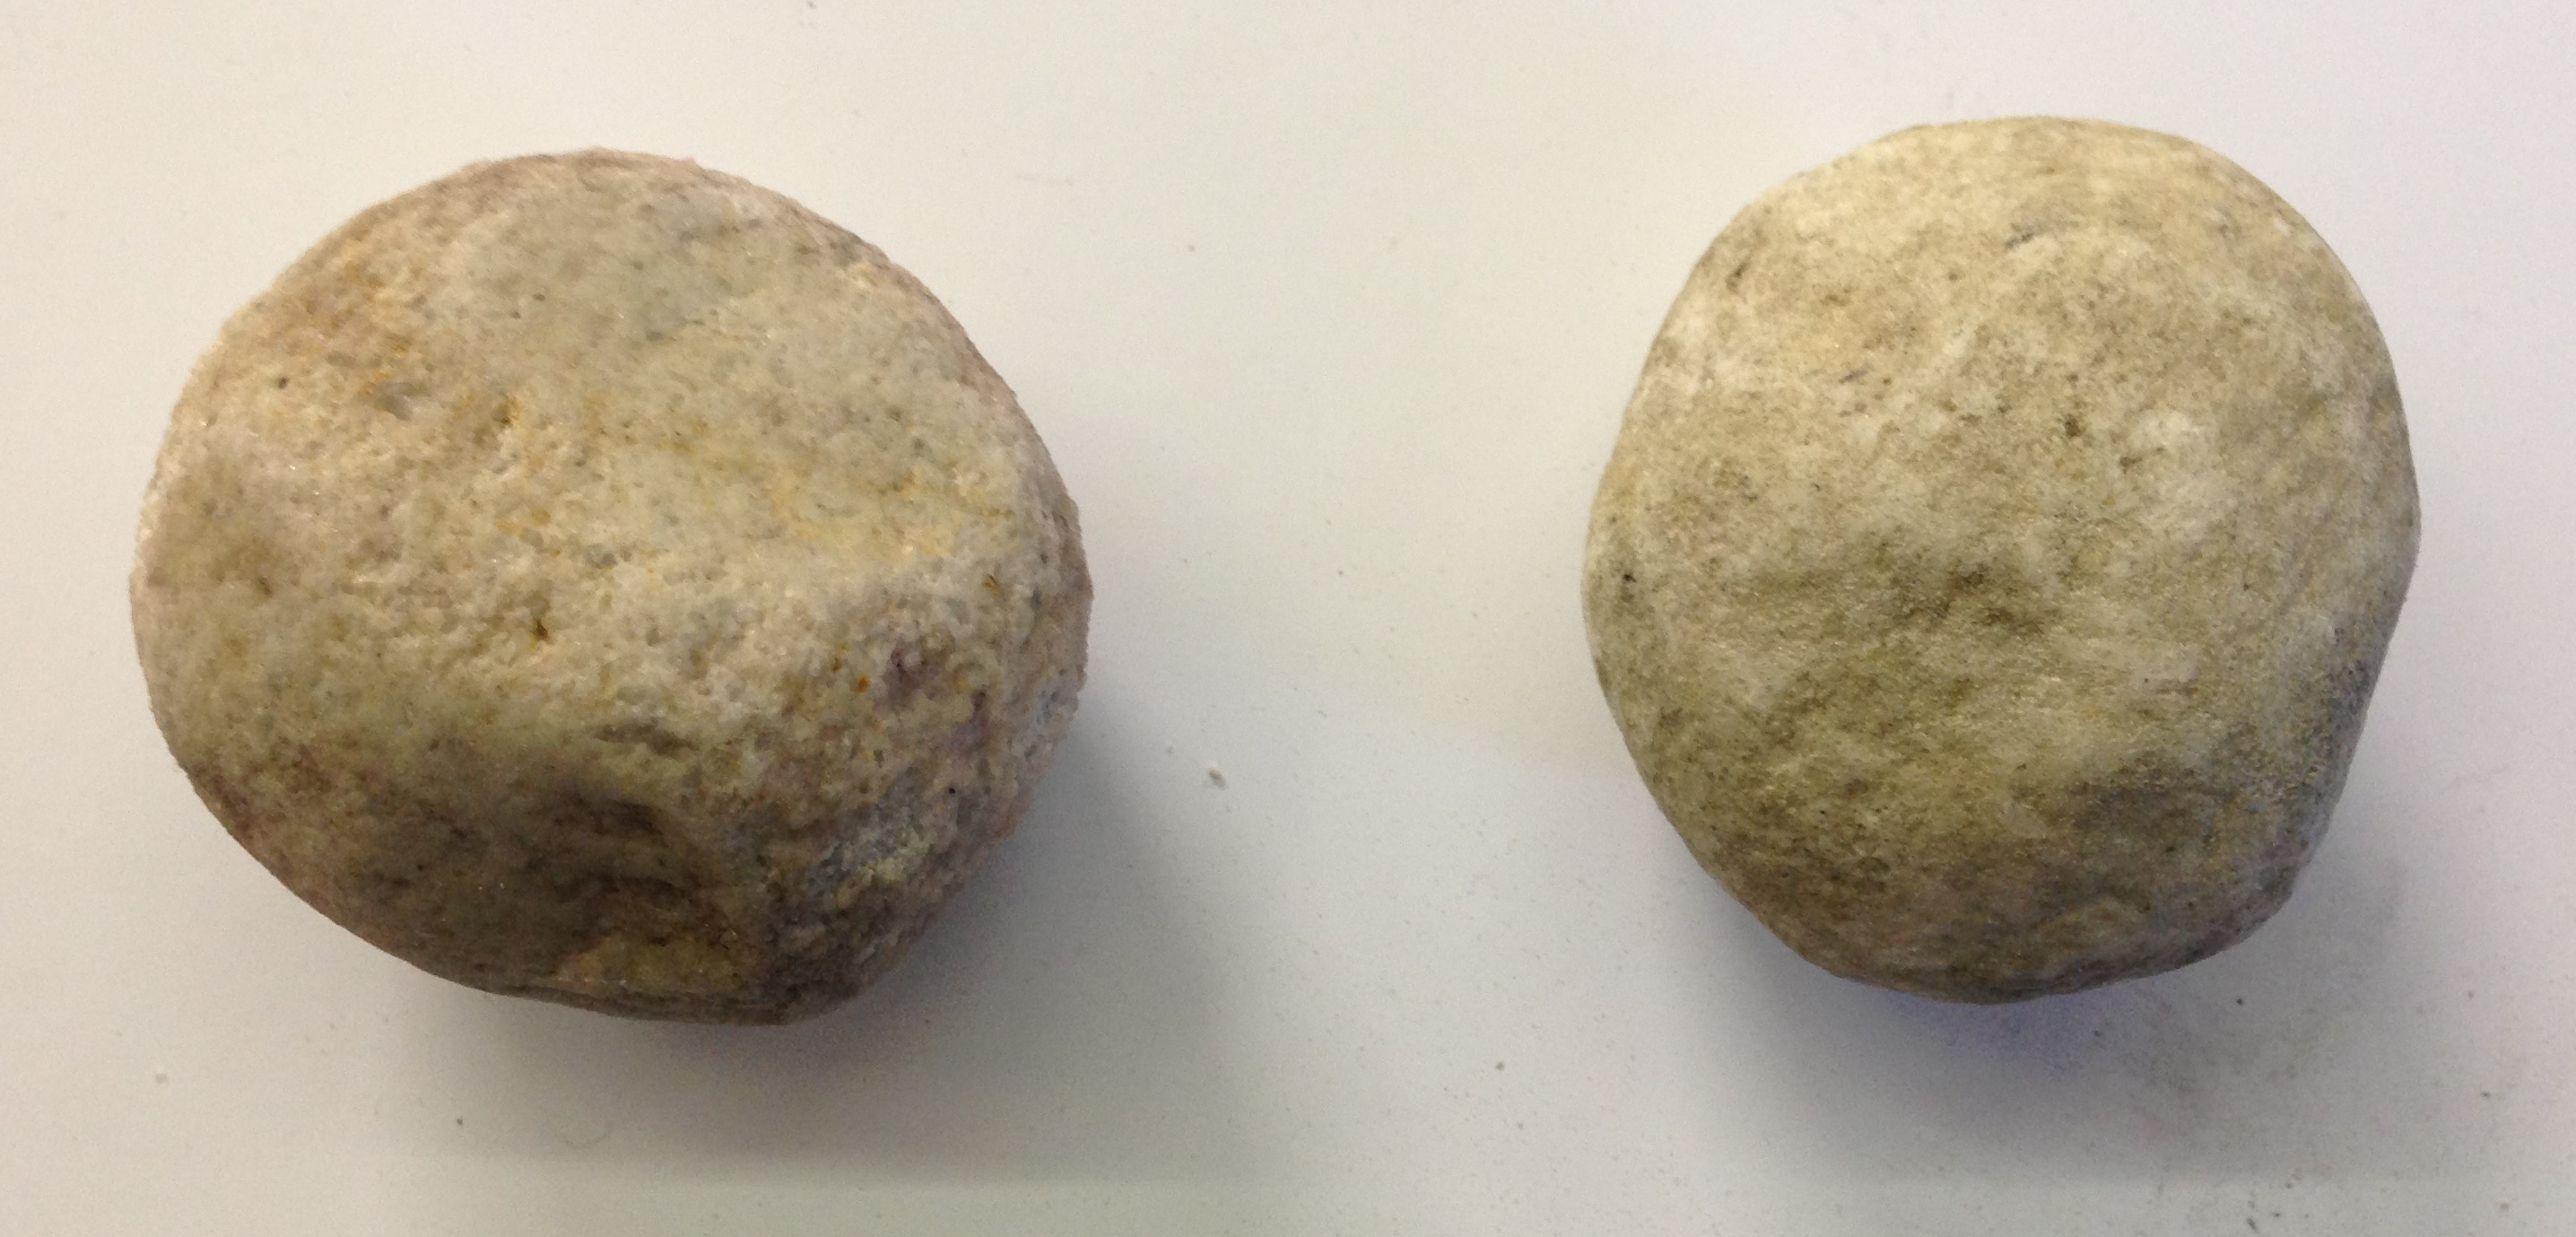 Fabricating rocks